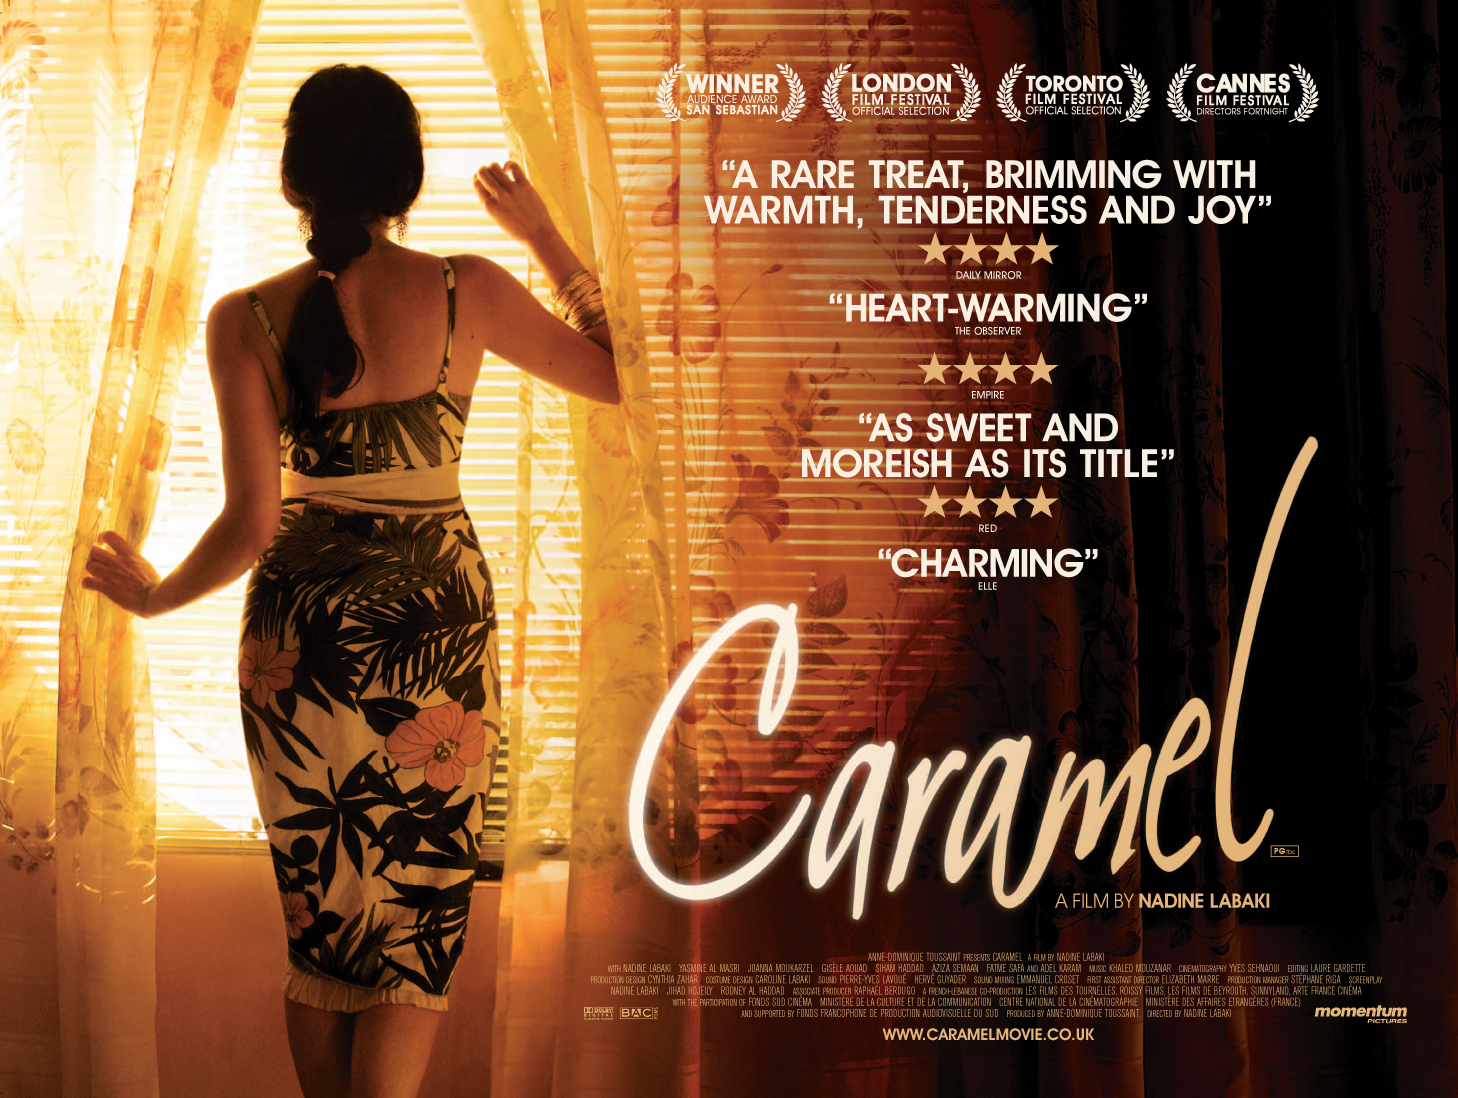 Caramel Film